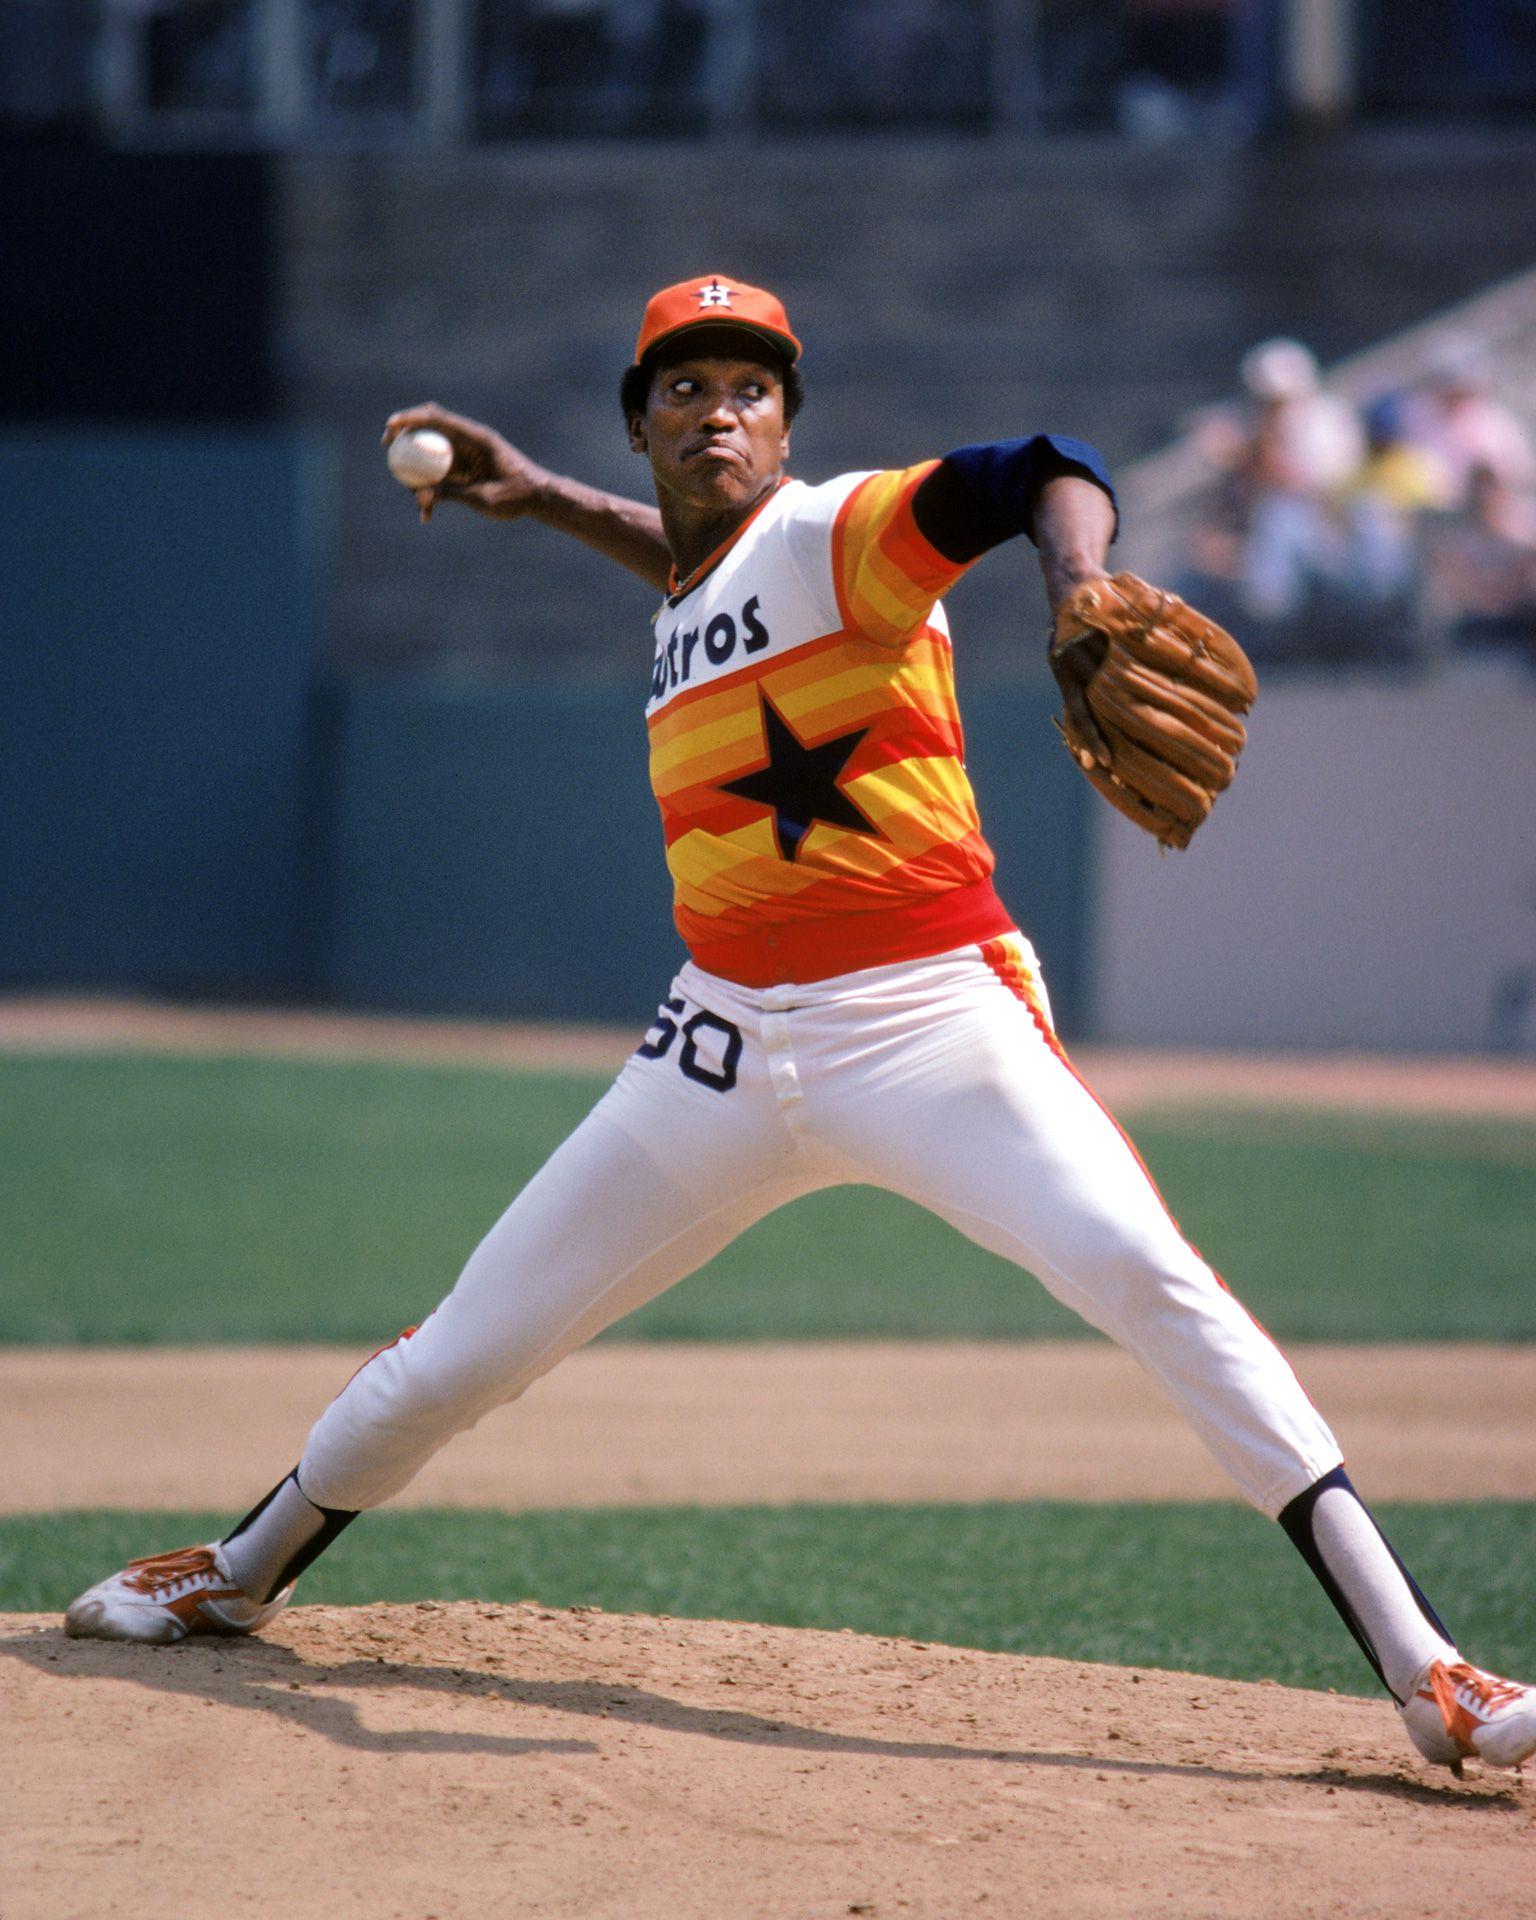 JR Richard - Houston Astros (With images) | Houston astros ...